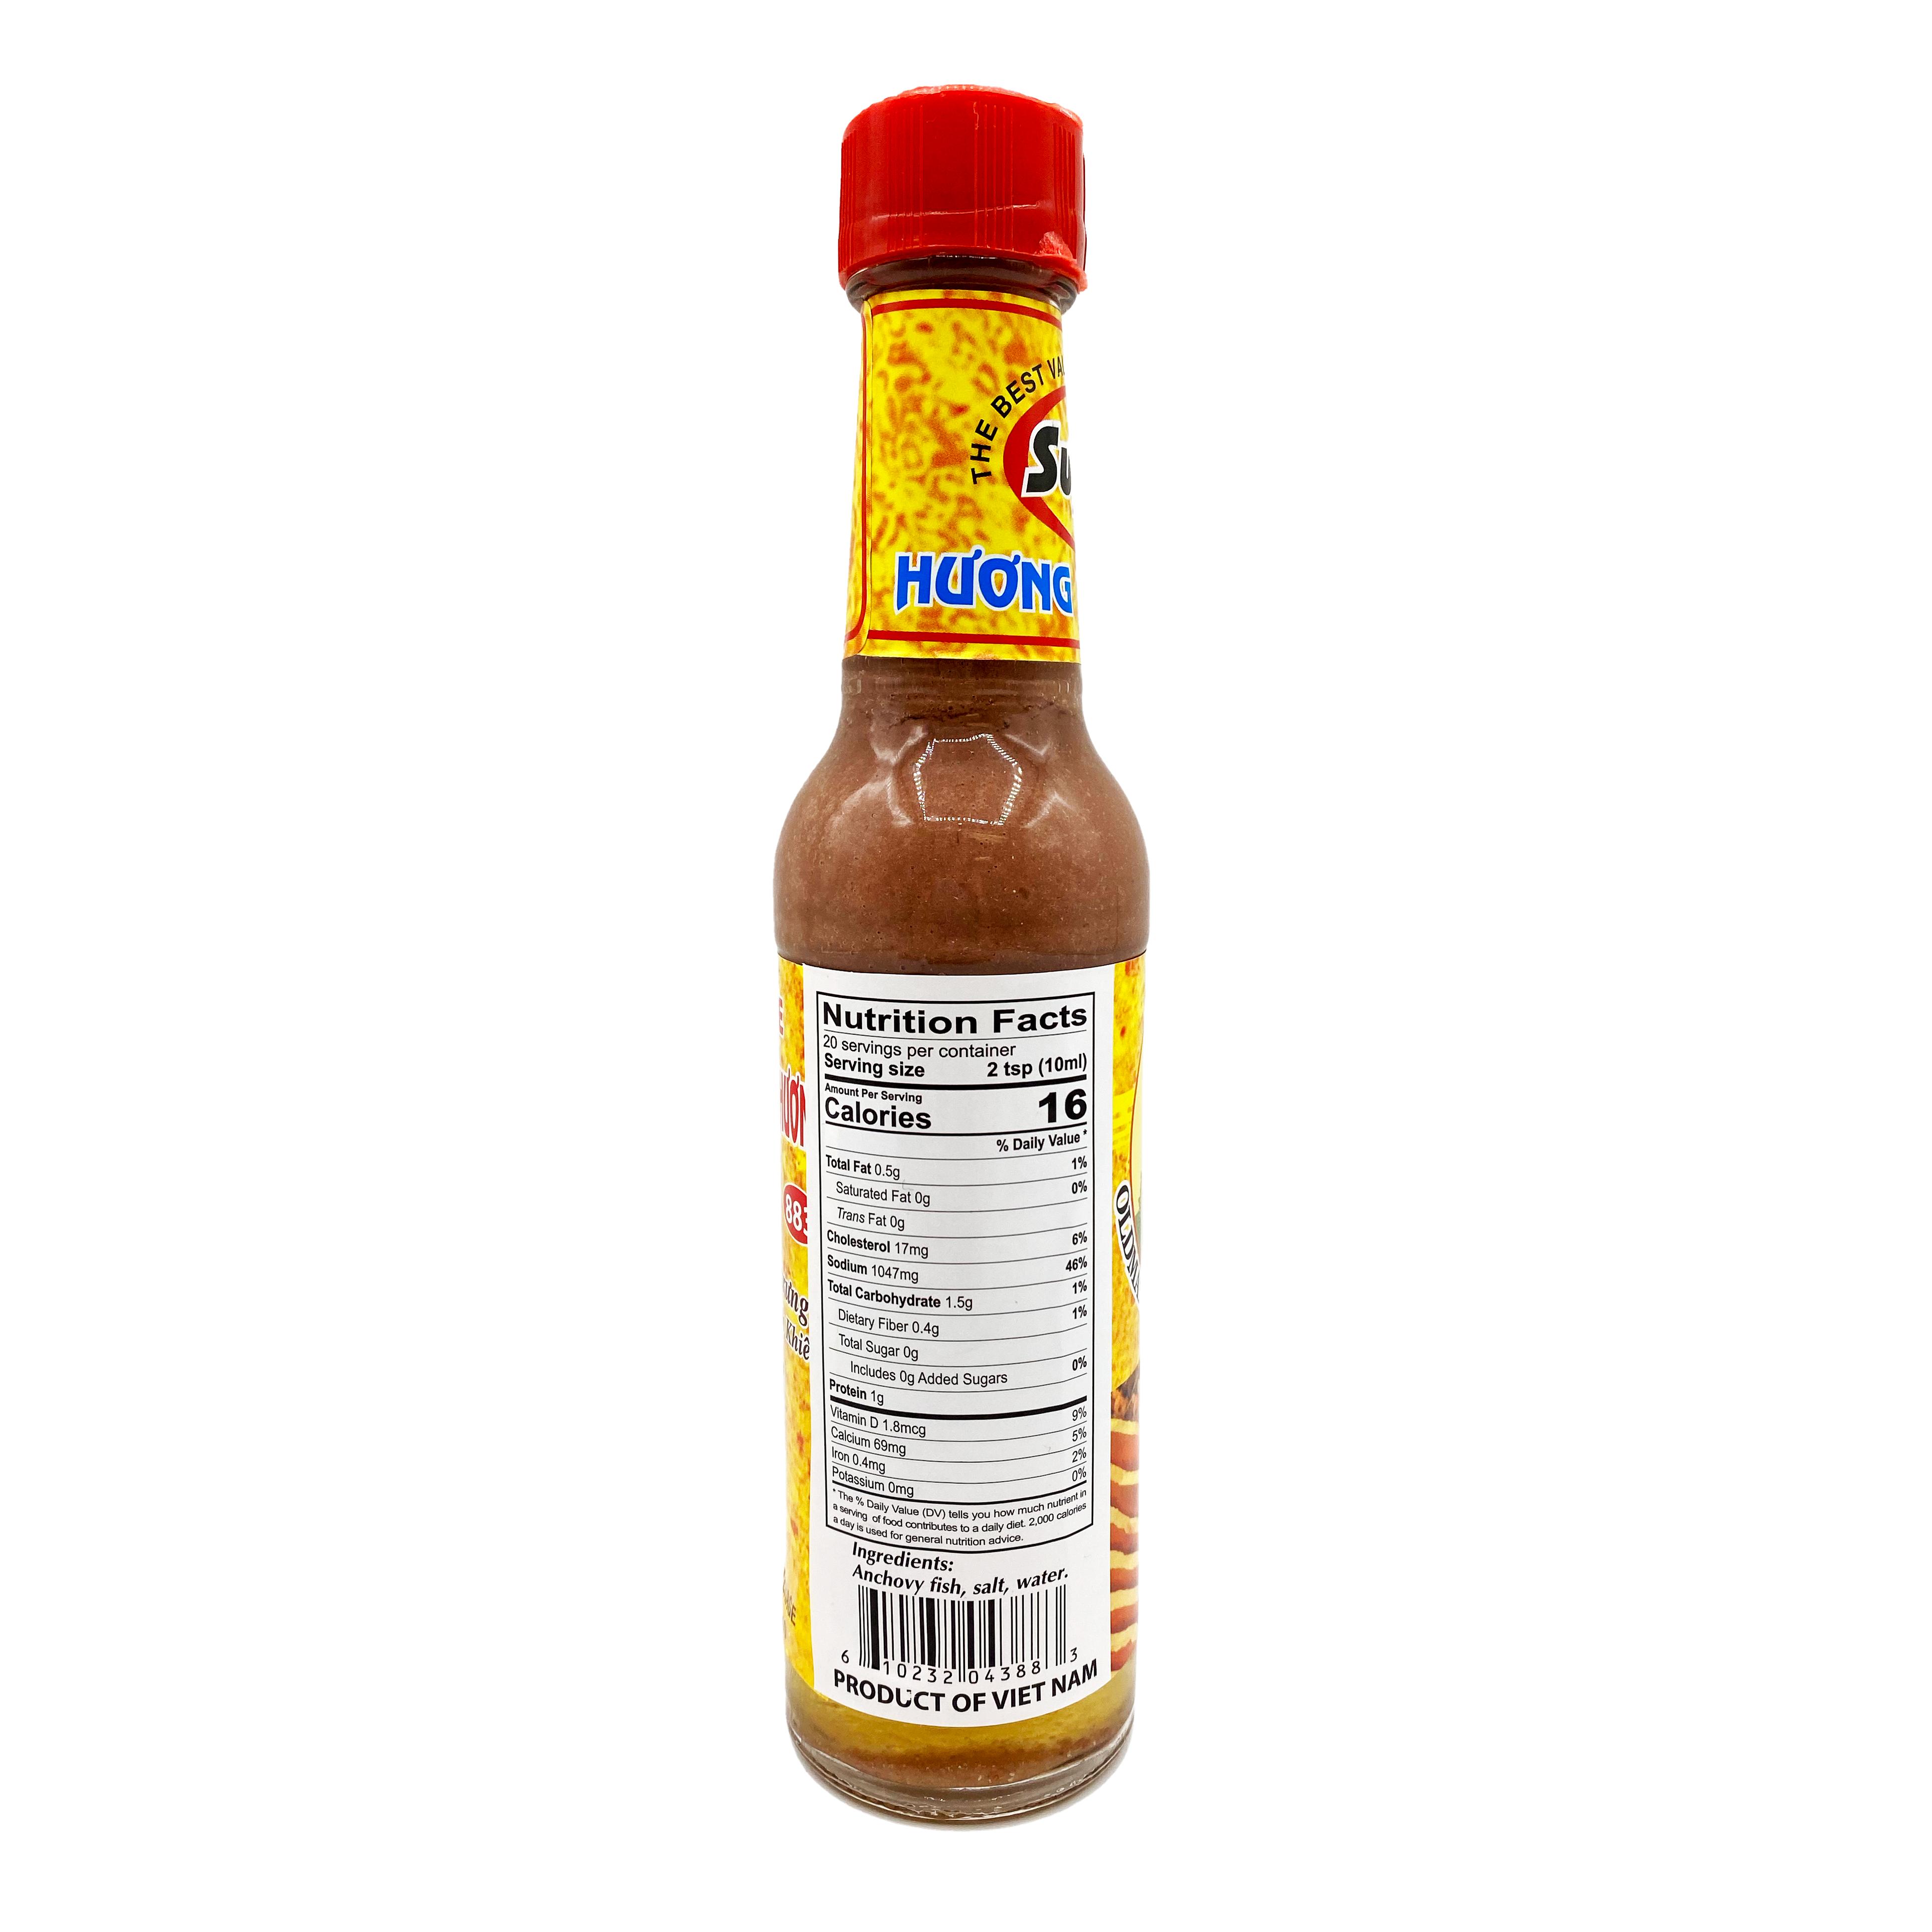 OLDMAN QUE HUONG Fish Sauce / Mam Nem (883) 7 FL OZ